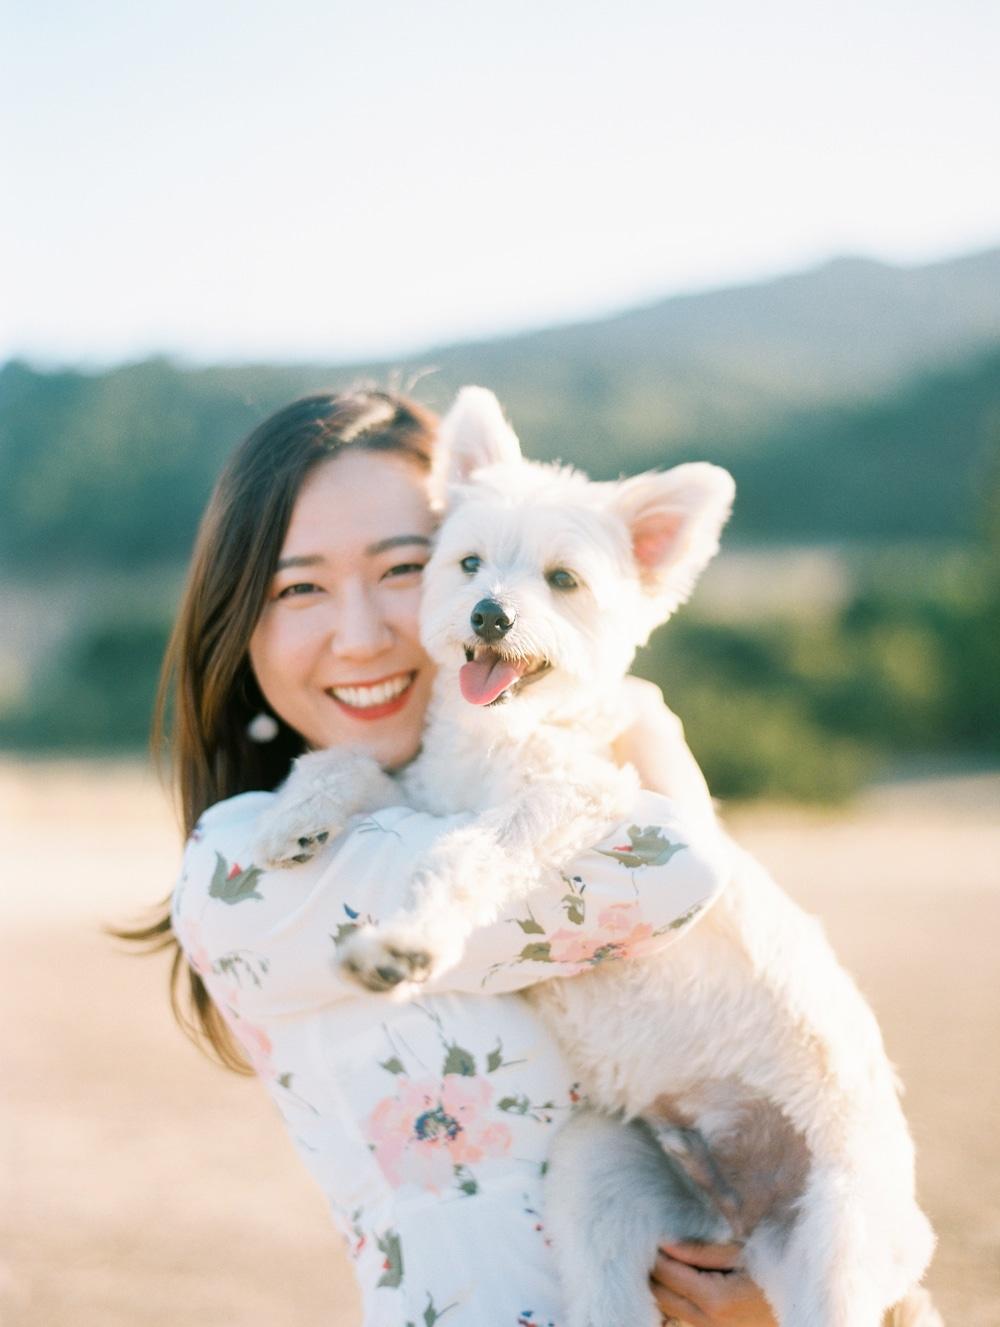 Kristin-La-Voie-Photography-california-wedding-photographer-dog-session-rancho-san-antonio-los-altos-5